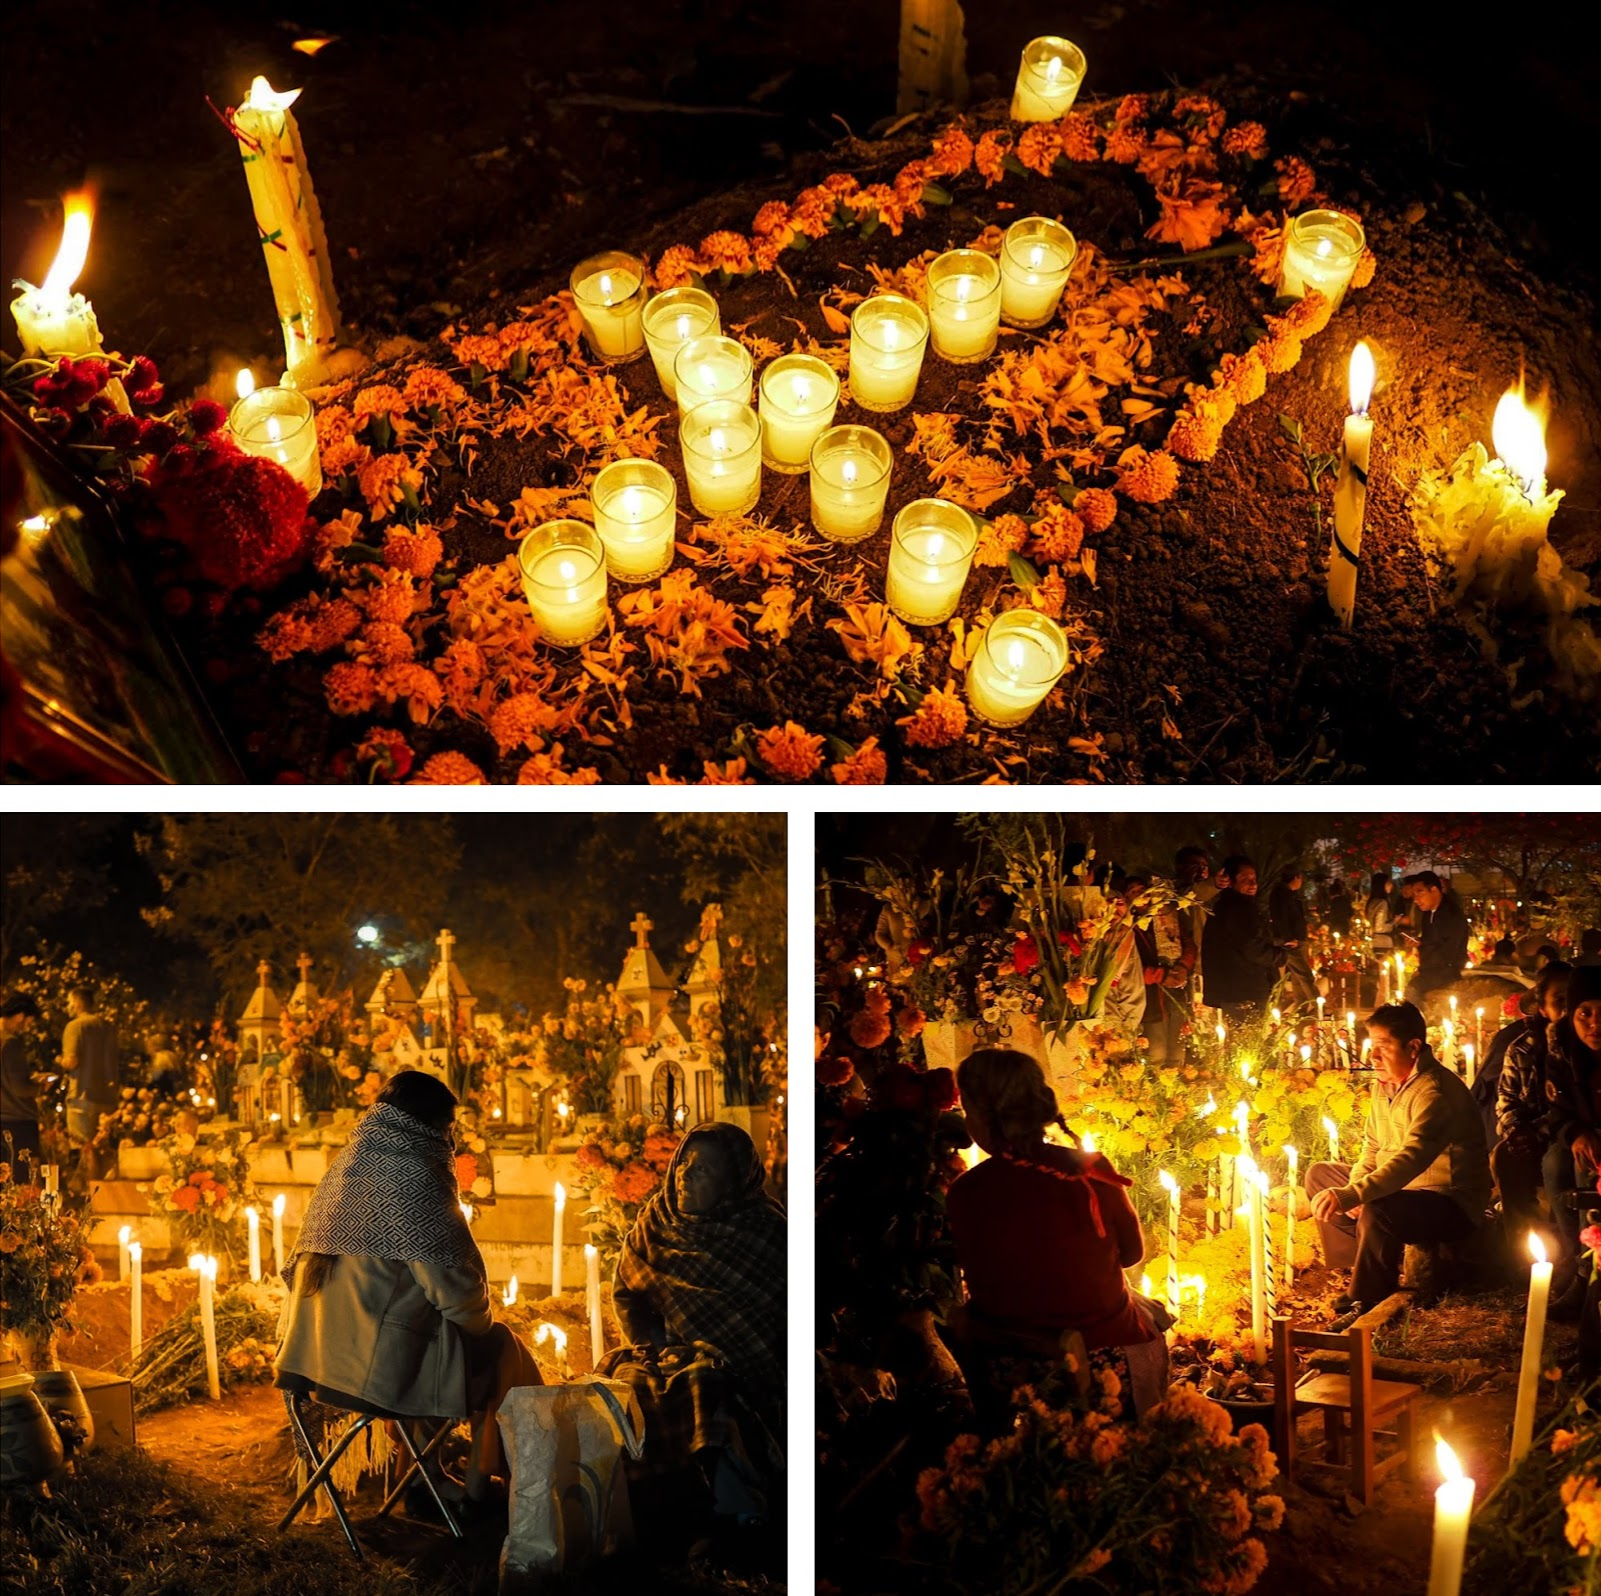 Scenes from Atzompa cemetery